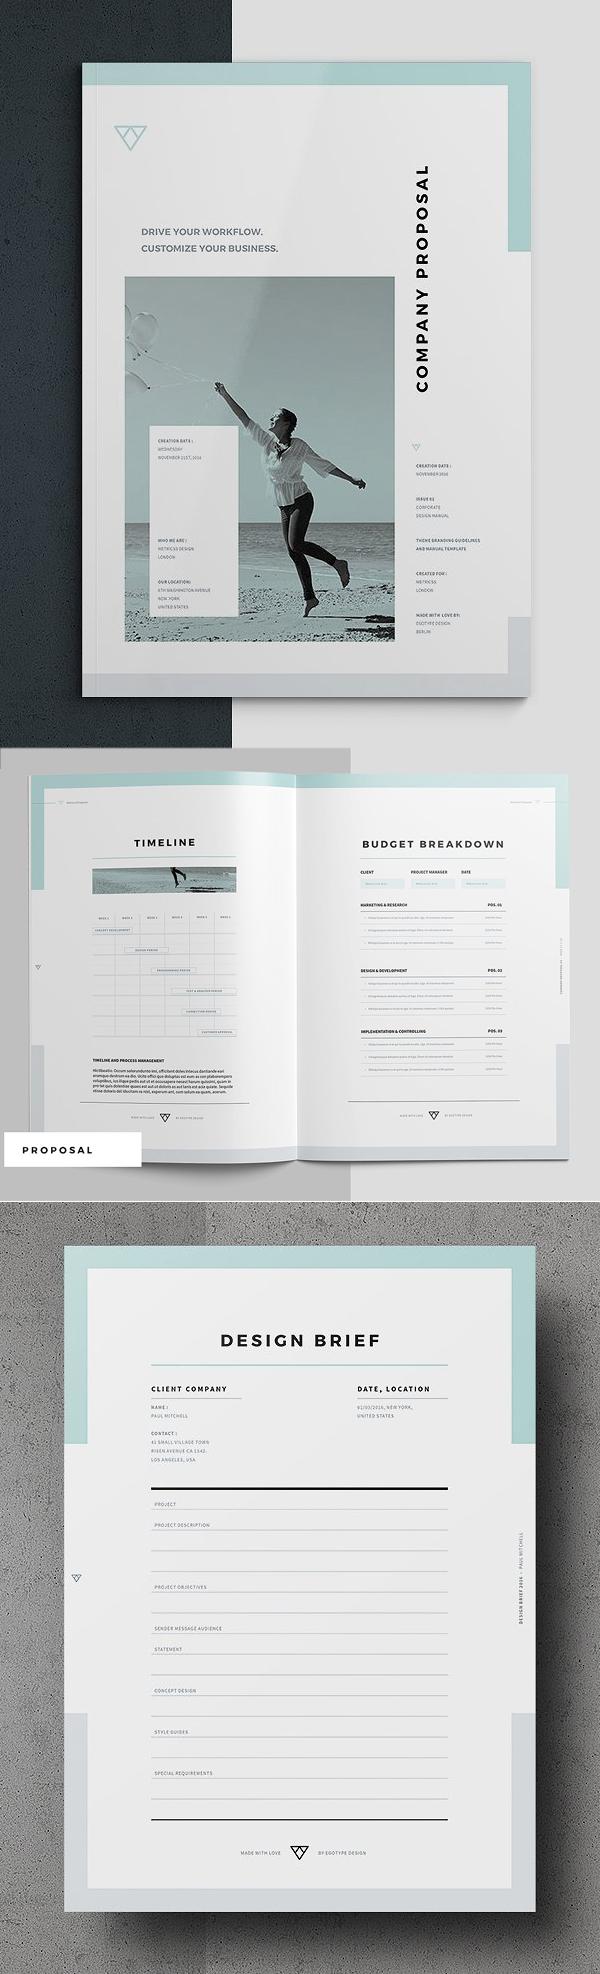 100 Professional Corporate Brochure Templates - 88